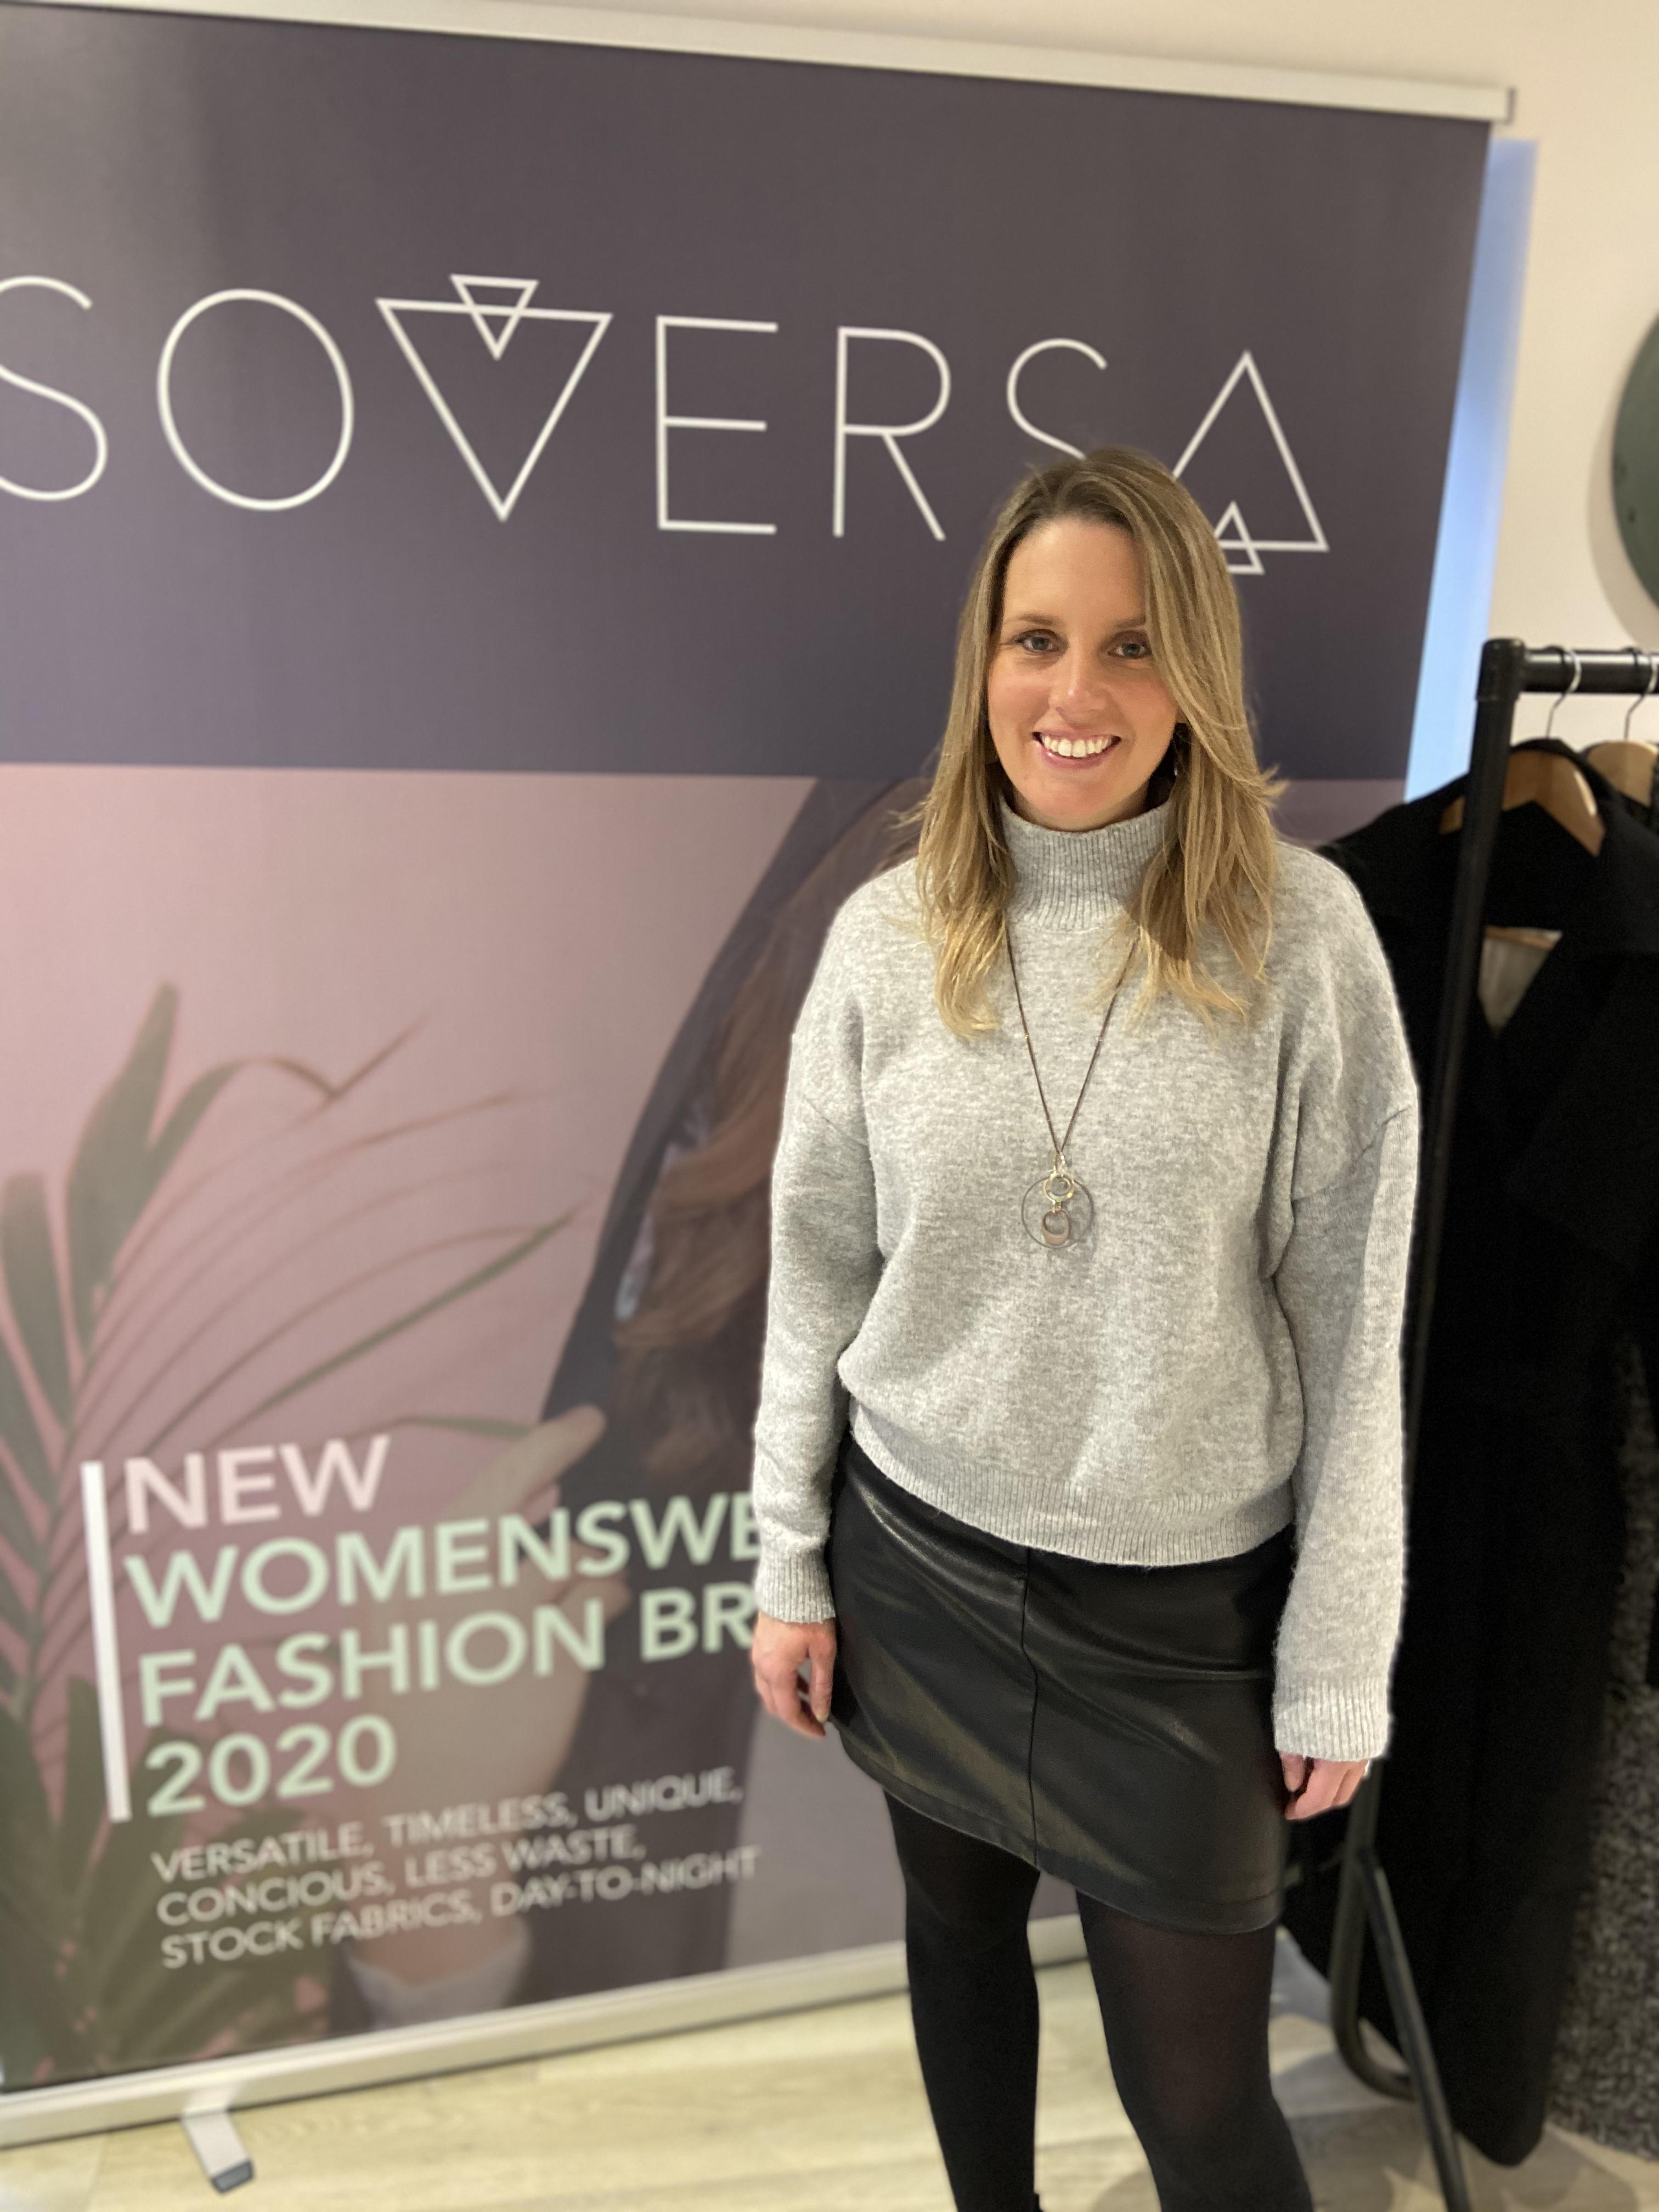 Local Fashion Designer Aims to Raise £100k on Kickstarter